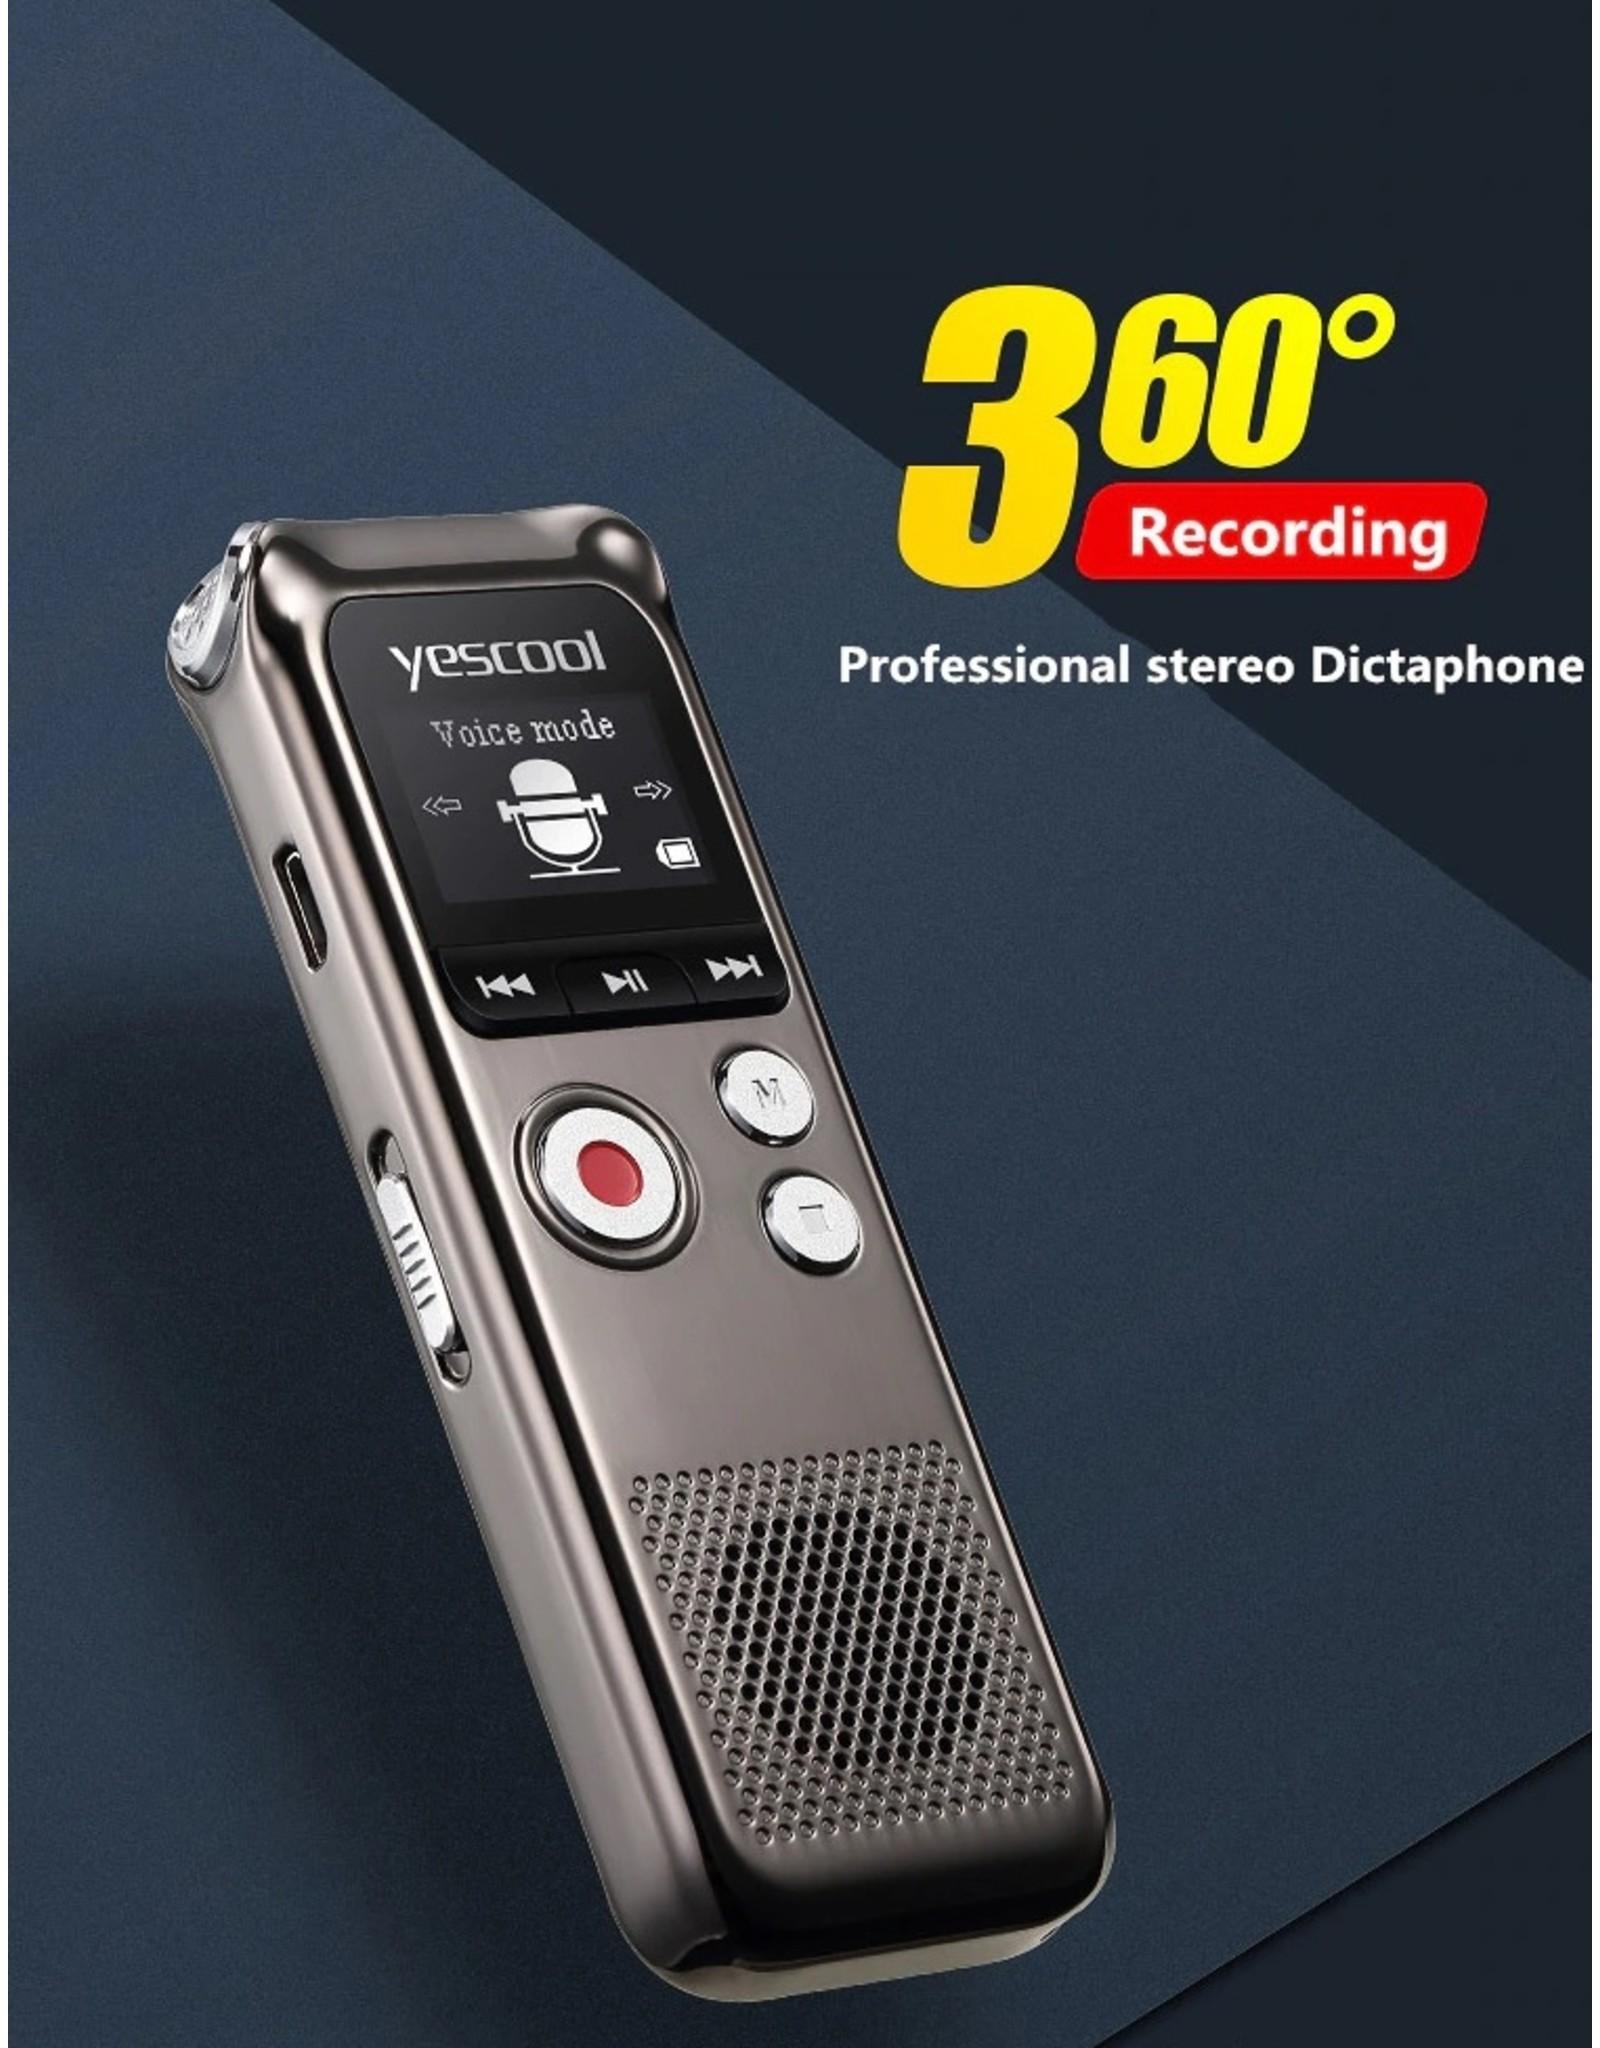 Premium Digitale Recorder - Premium Voice Recorder - Multifunctionele Voice Recorder - Dictafoon 8 GB - Audio Memo Recorder Met USB - Spraak Recorder - Sound – Geluid Recorder - Opname Apparaat - Met MP3 Speler Functie – 8GB